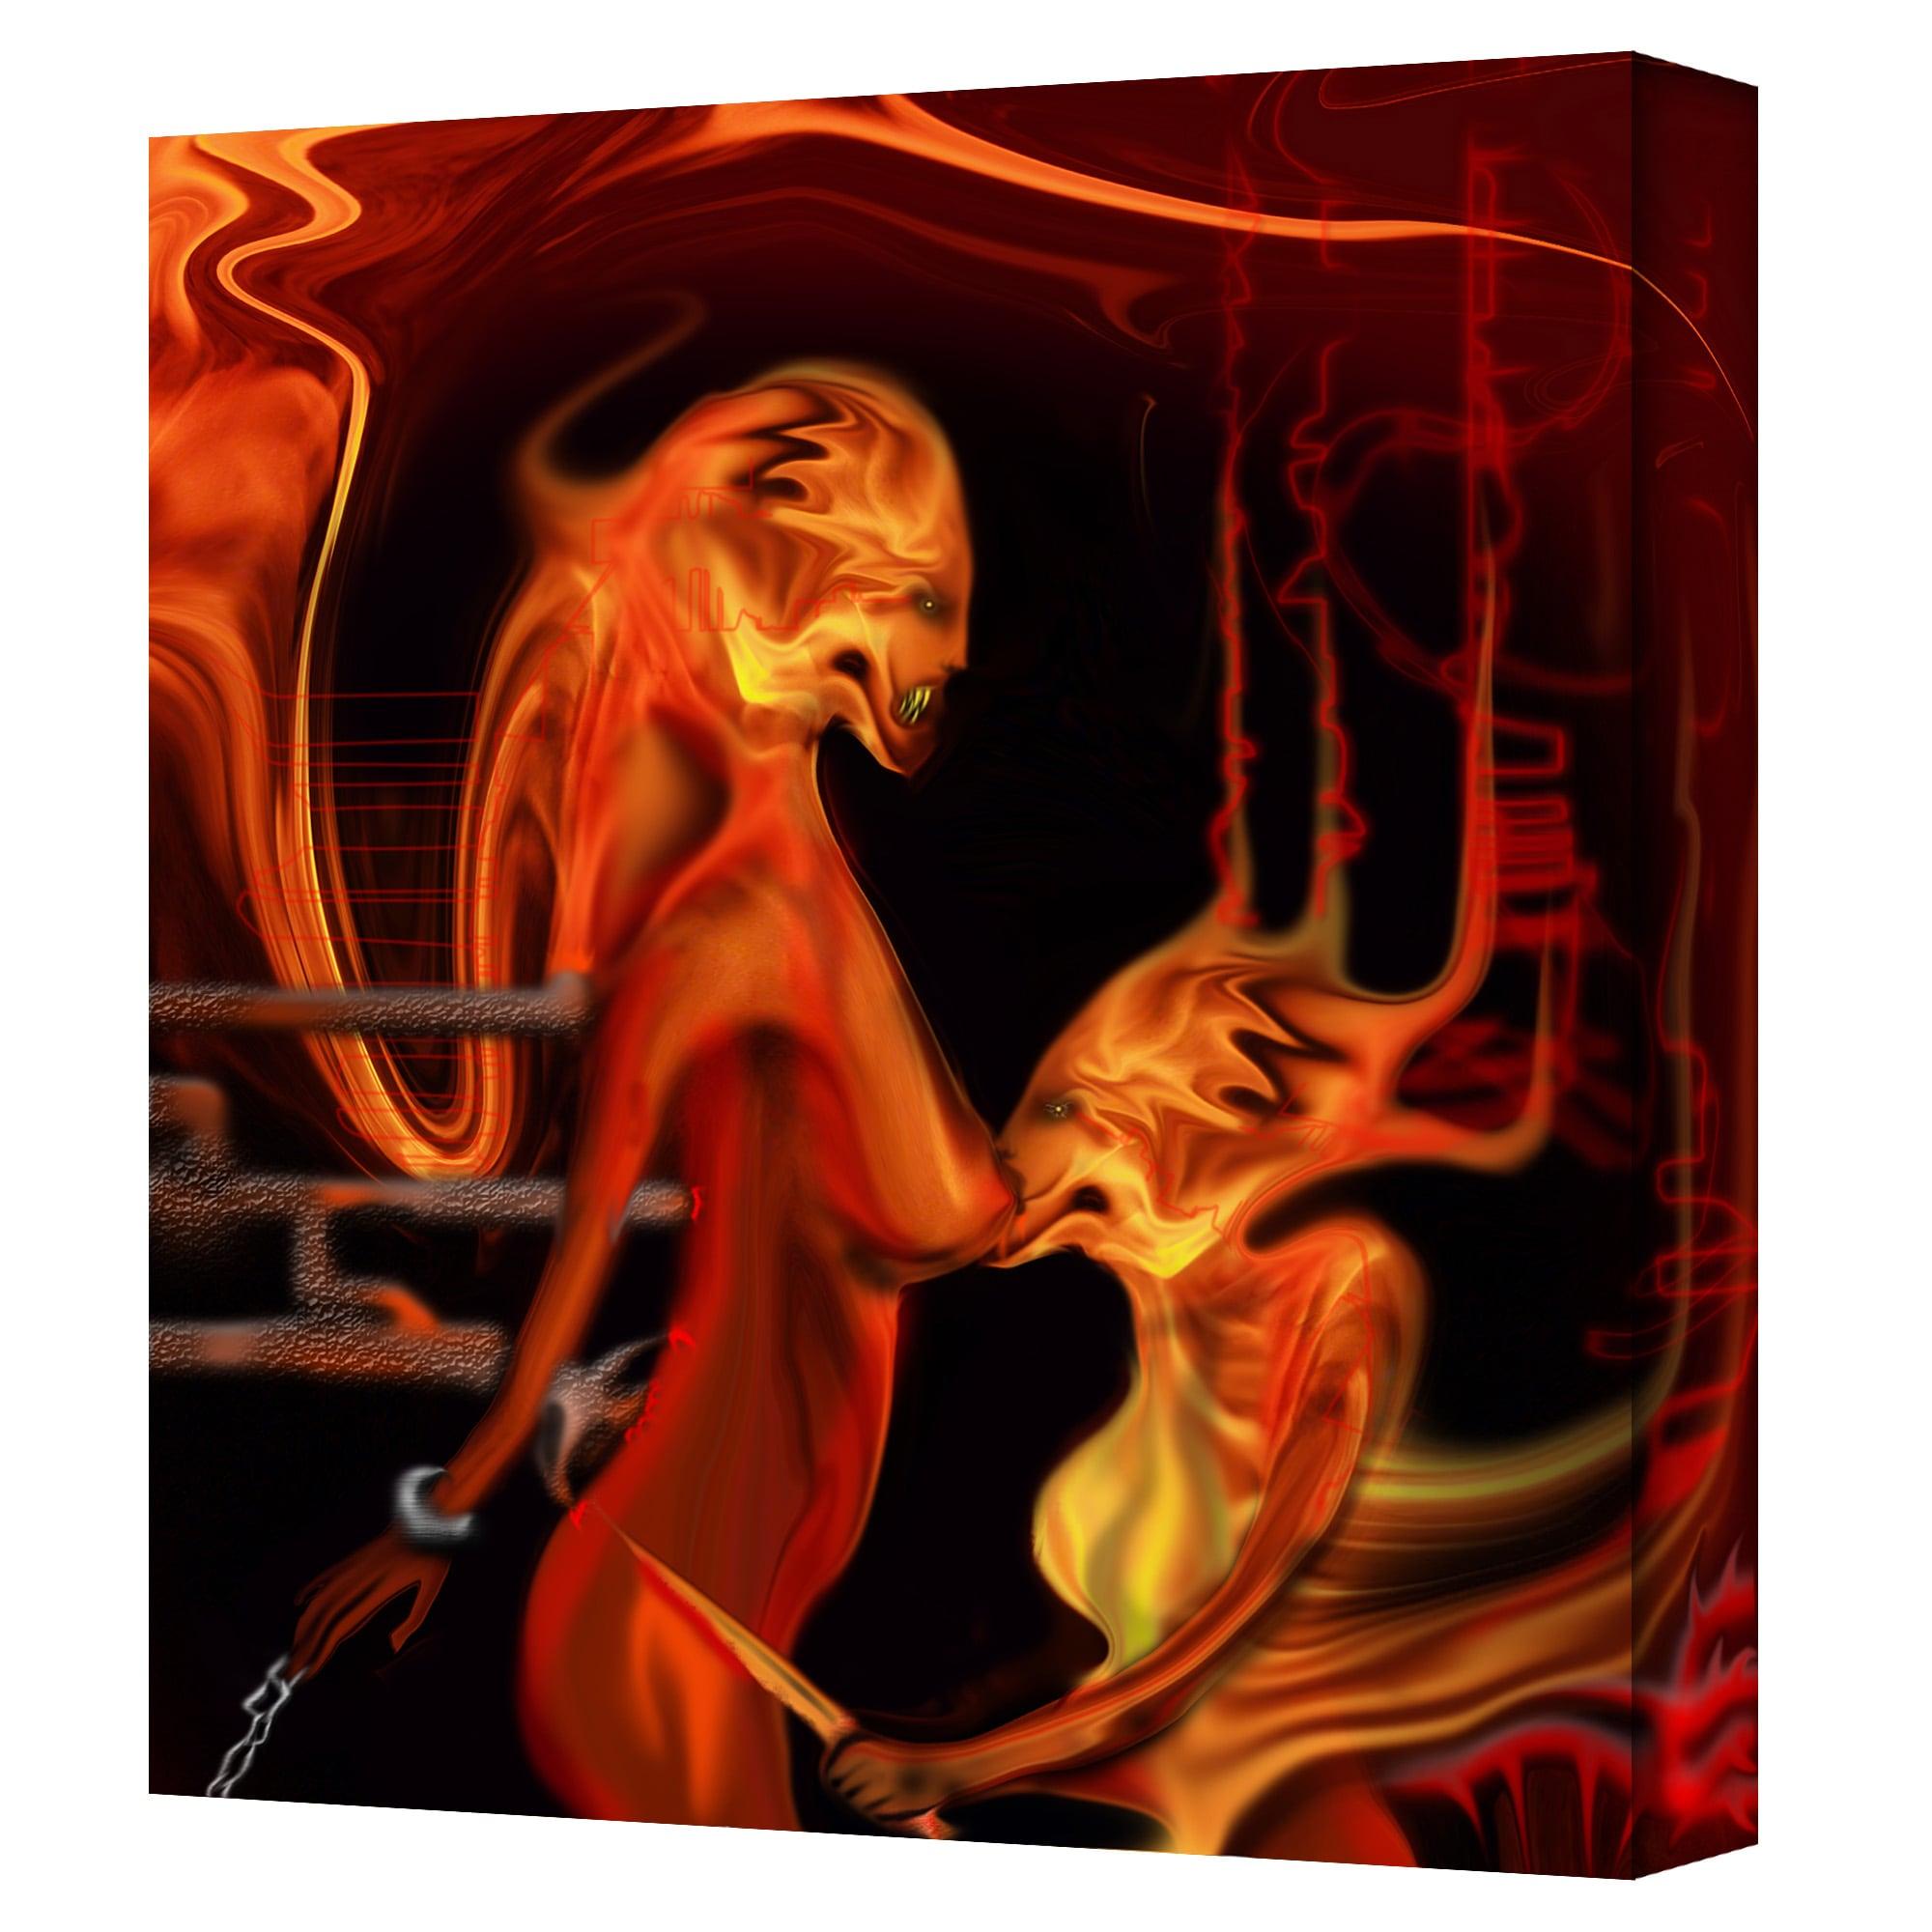 Michael L Stewart 'Parasite' Gallery Wrapped Canvas Art (24 x 24)